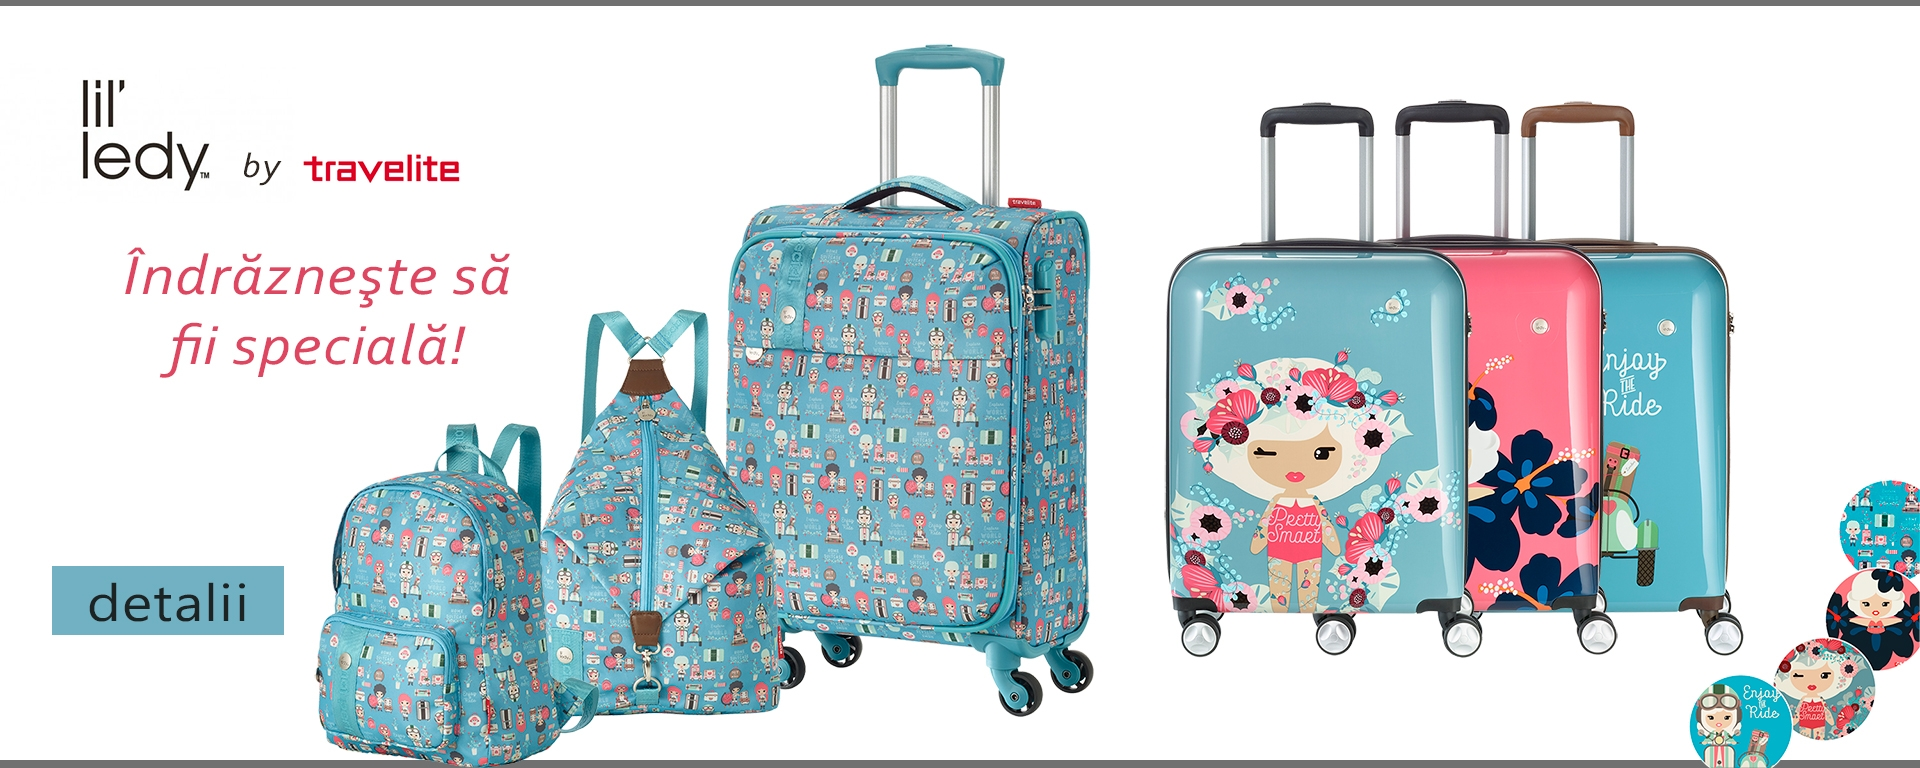 Lil'Ledy by Travelite